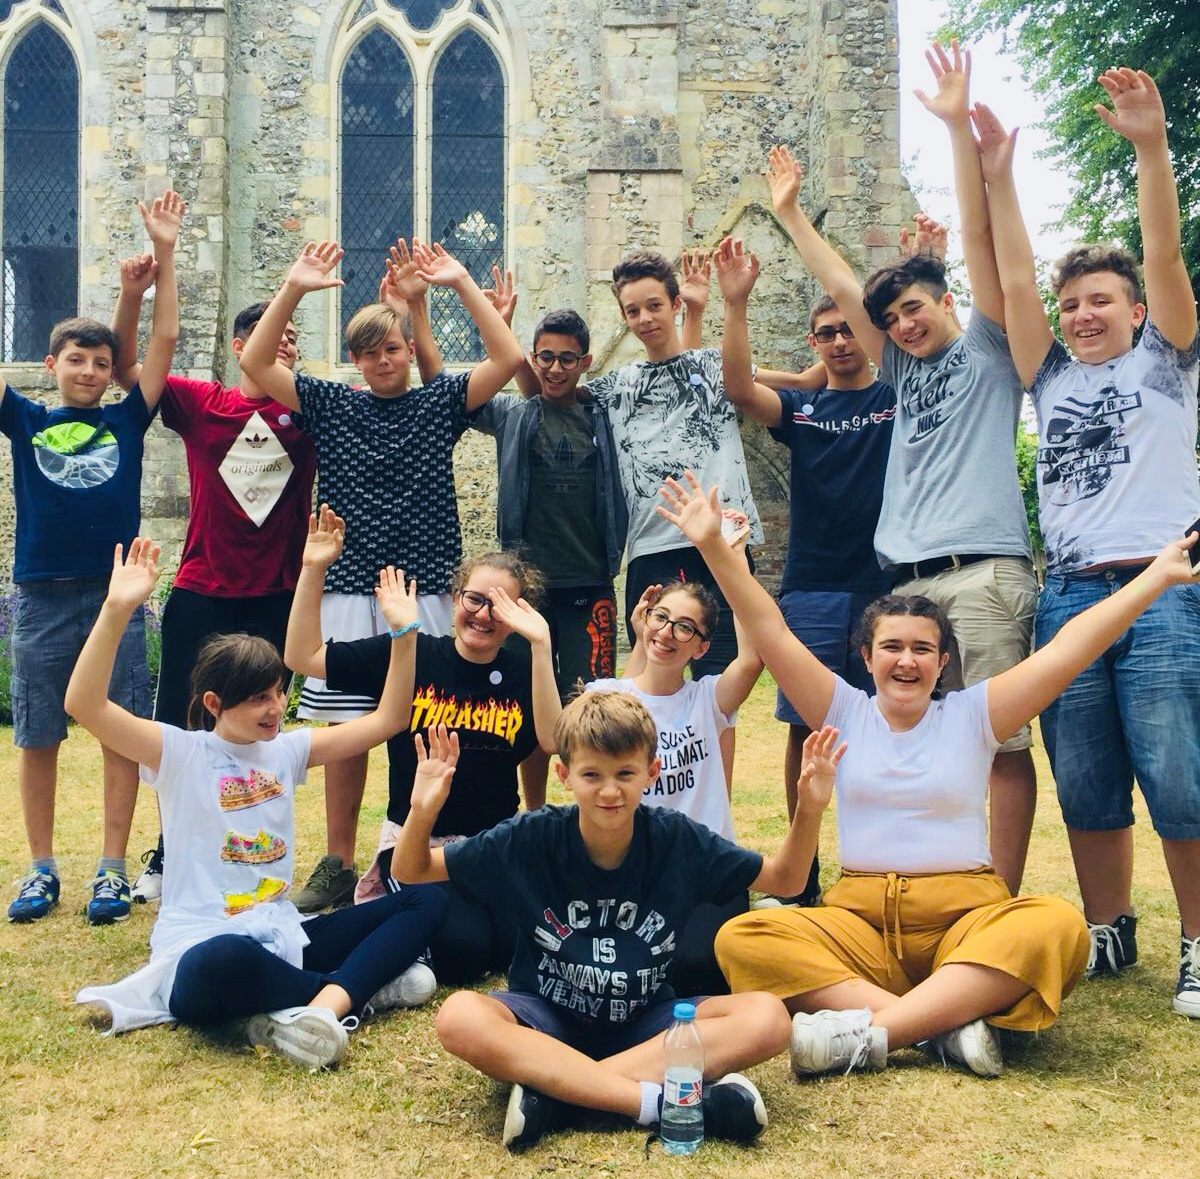 Vacanza studio 2019 (Inghilterra, 11-13 anni) | I Viaggi di TELS